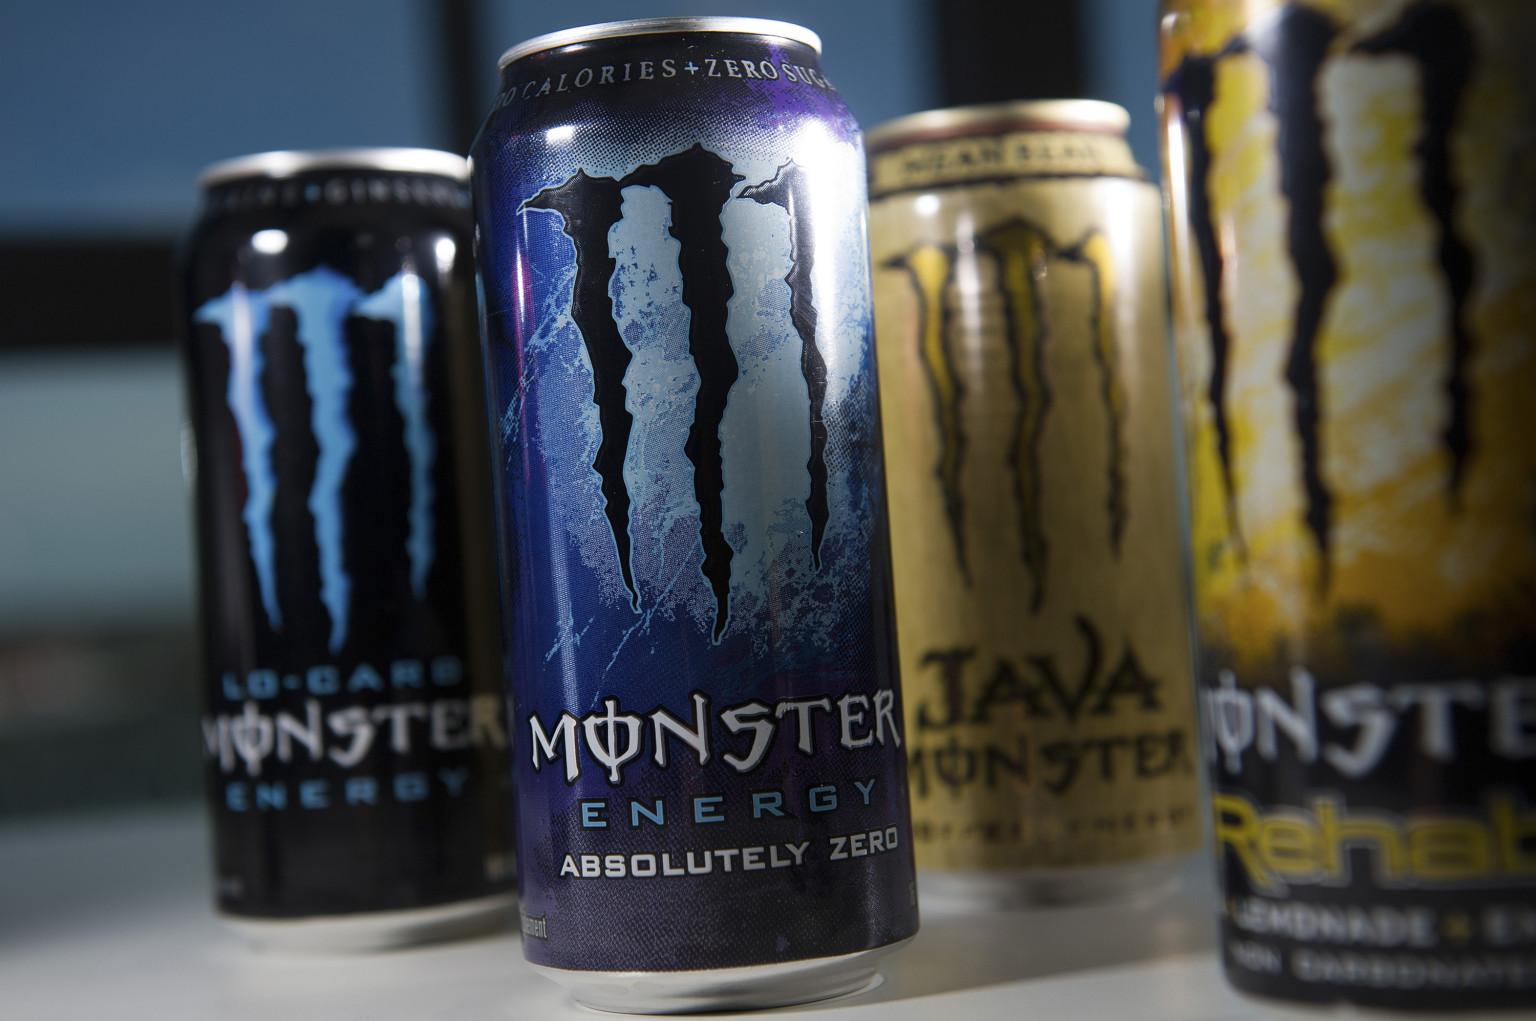 Monster: H εταιρεία με την μεγαλύτερη ανατίμηση της αξίας της από το 2000 με… 60.000%